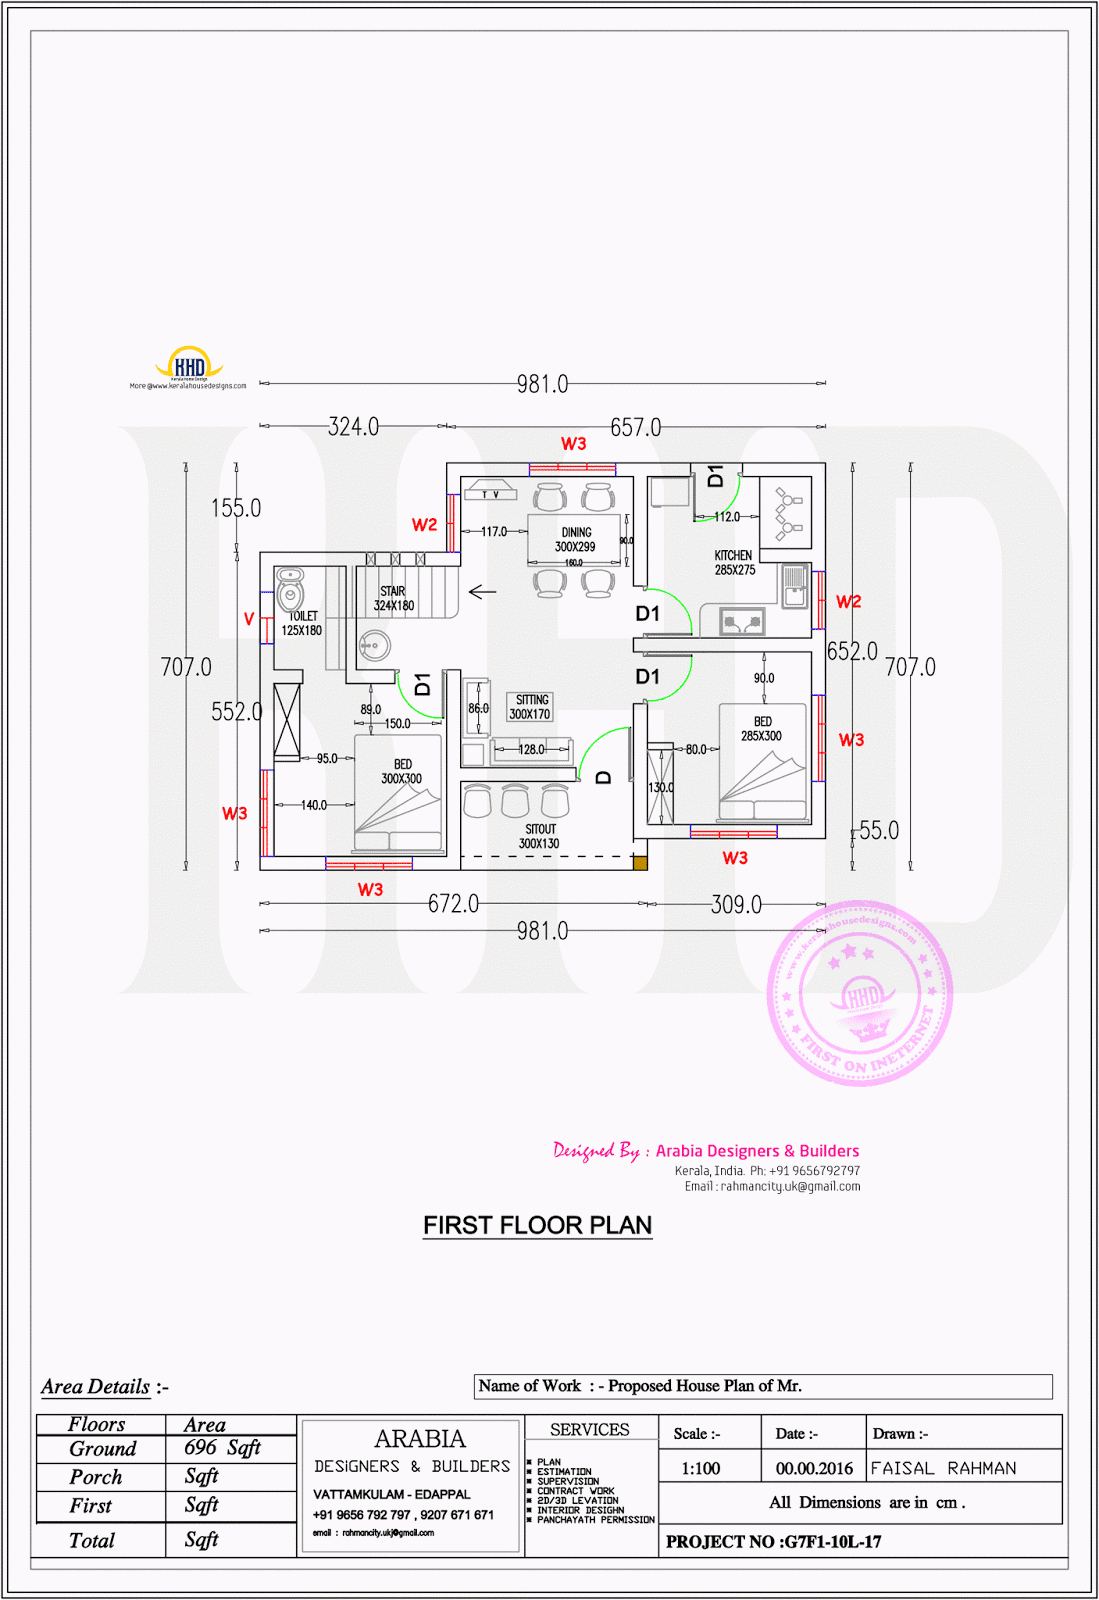 Rs.10 lakh Kerala house plan - Kerala home design and floor ... on tekkit house, ffxiv house, everquest 2 house, archeage house, stardoll house, angry birds house, wildstar house, wurm online house, facebook house, hawken house, tibia house, fallout house, grand fantasia house, onverse house, ffxi house, smallworlds house, imvu house, earthbound house, h1z1 house,